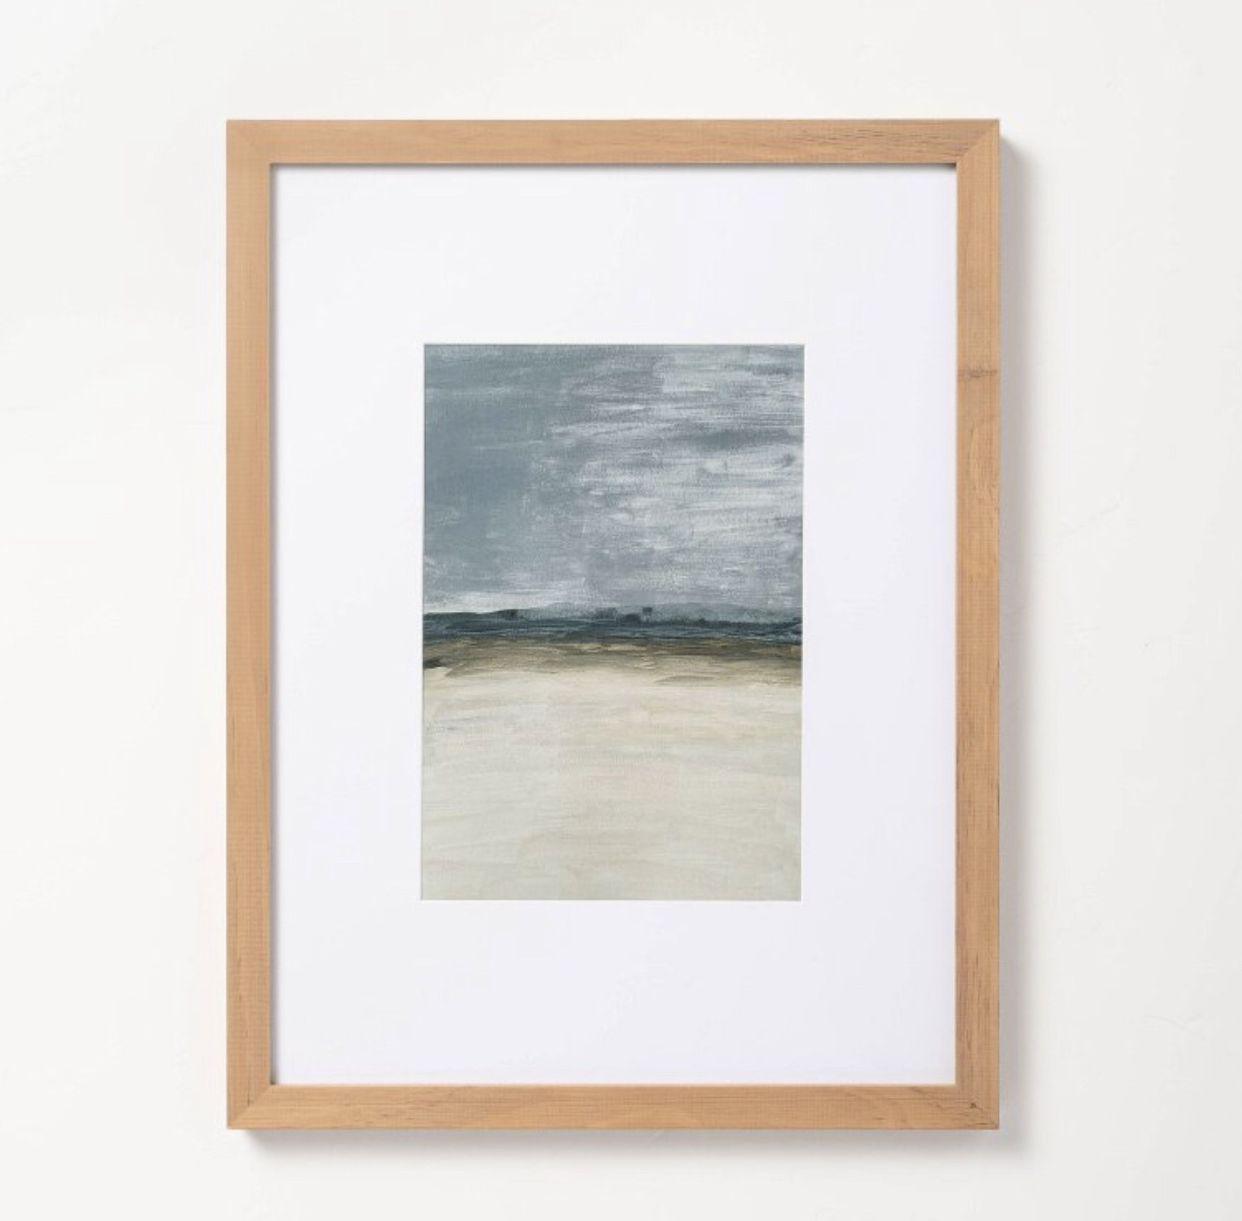 "12"" x 16"" Landscape Vertical Framed Wall Art - Hearth & Hand Magnolia"